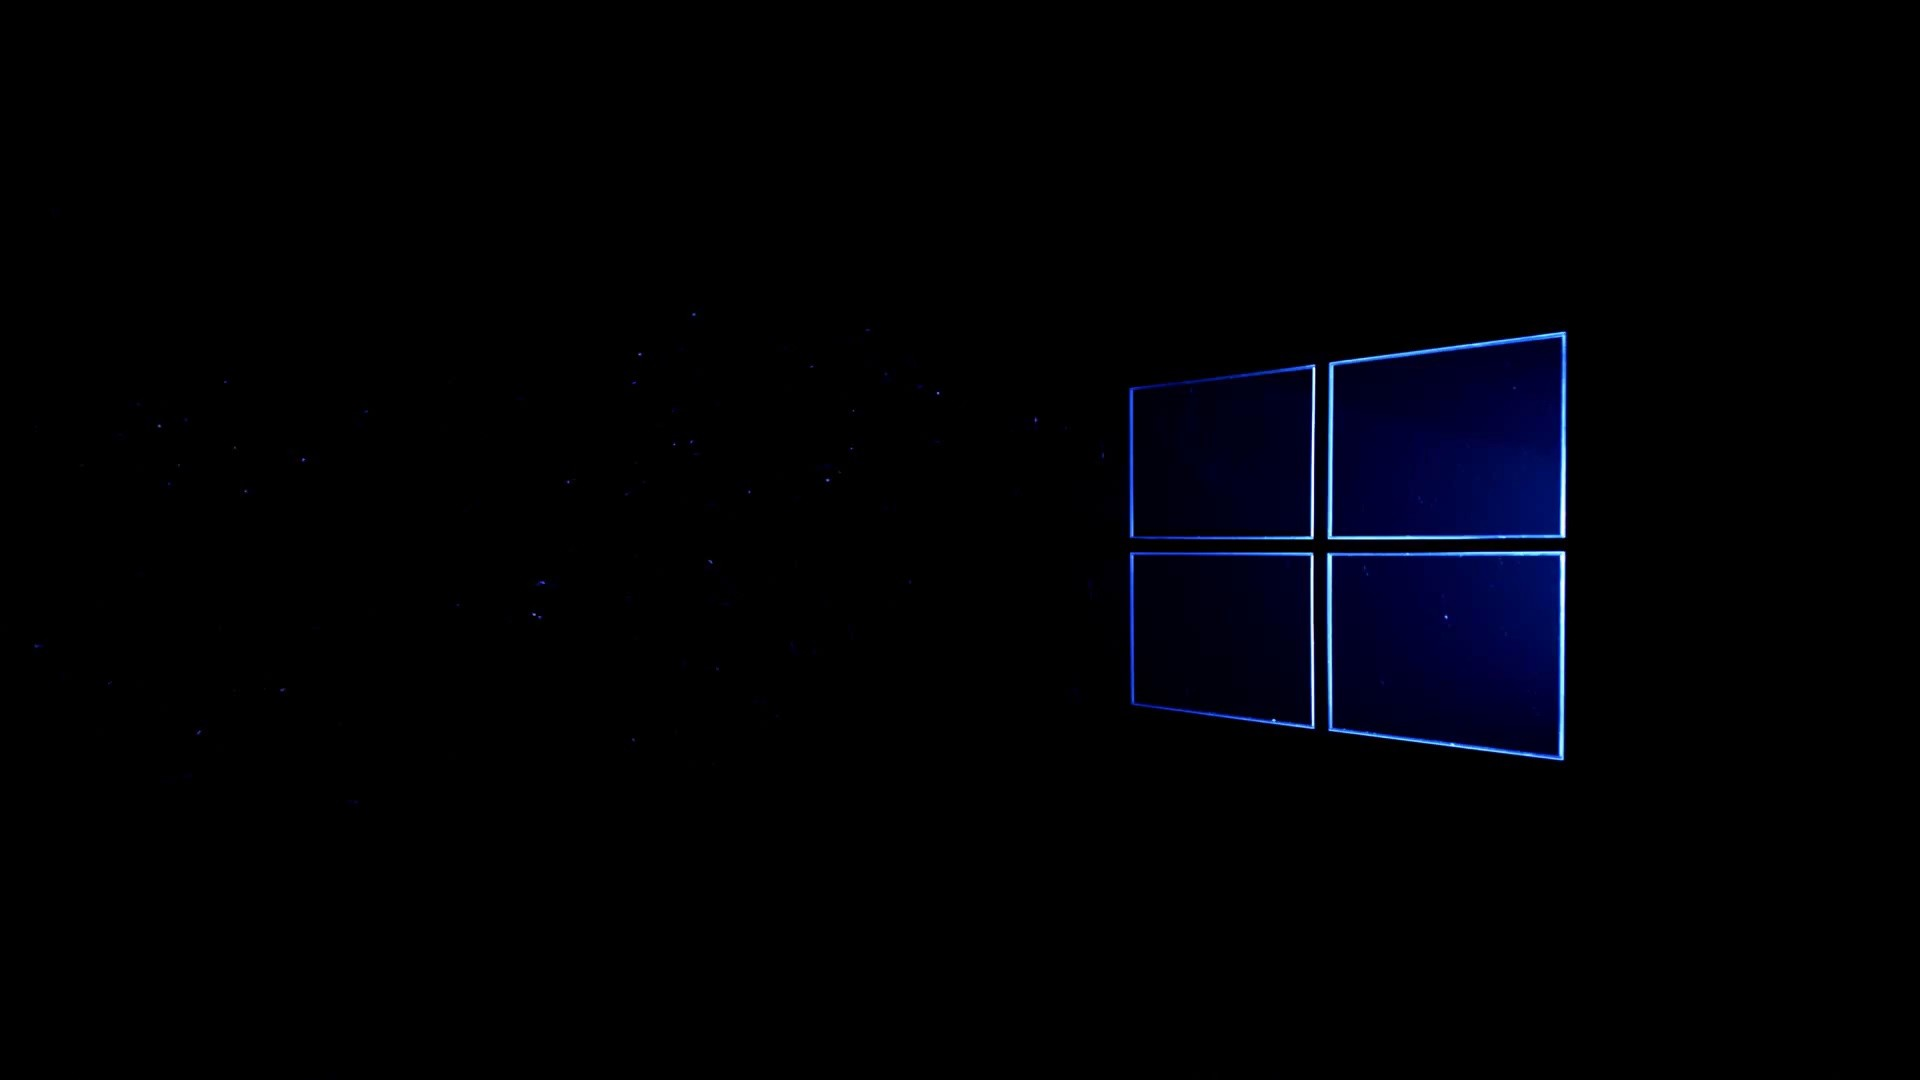 windows 10 fond d cran officiel et les coulisses de sa cr ation ginjfo. Black Bedroom Furniture Sets. Home Design Ideas